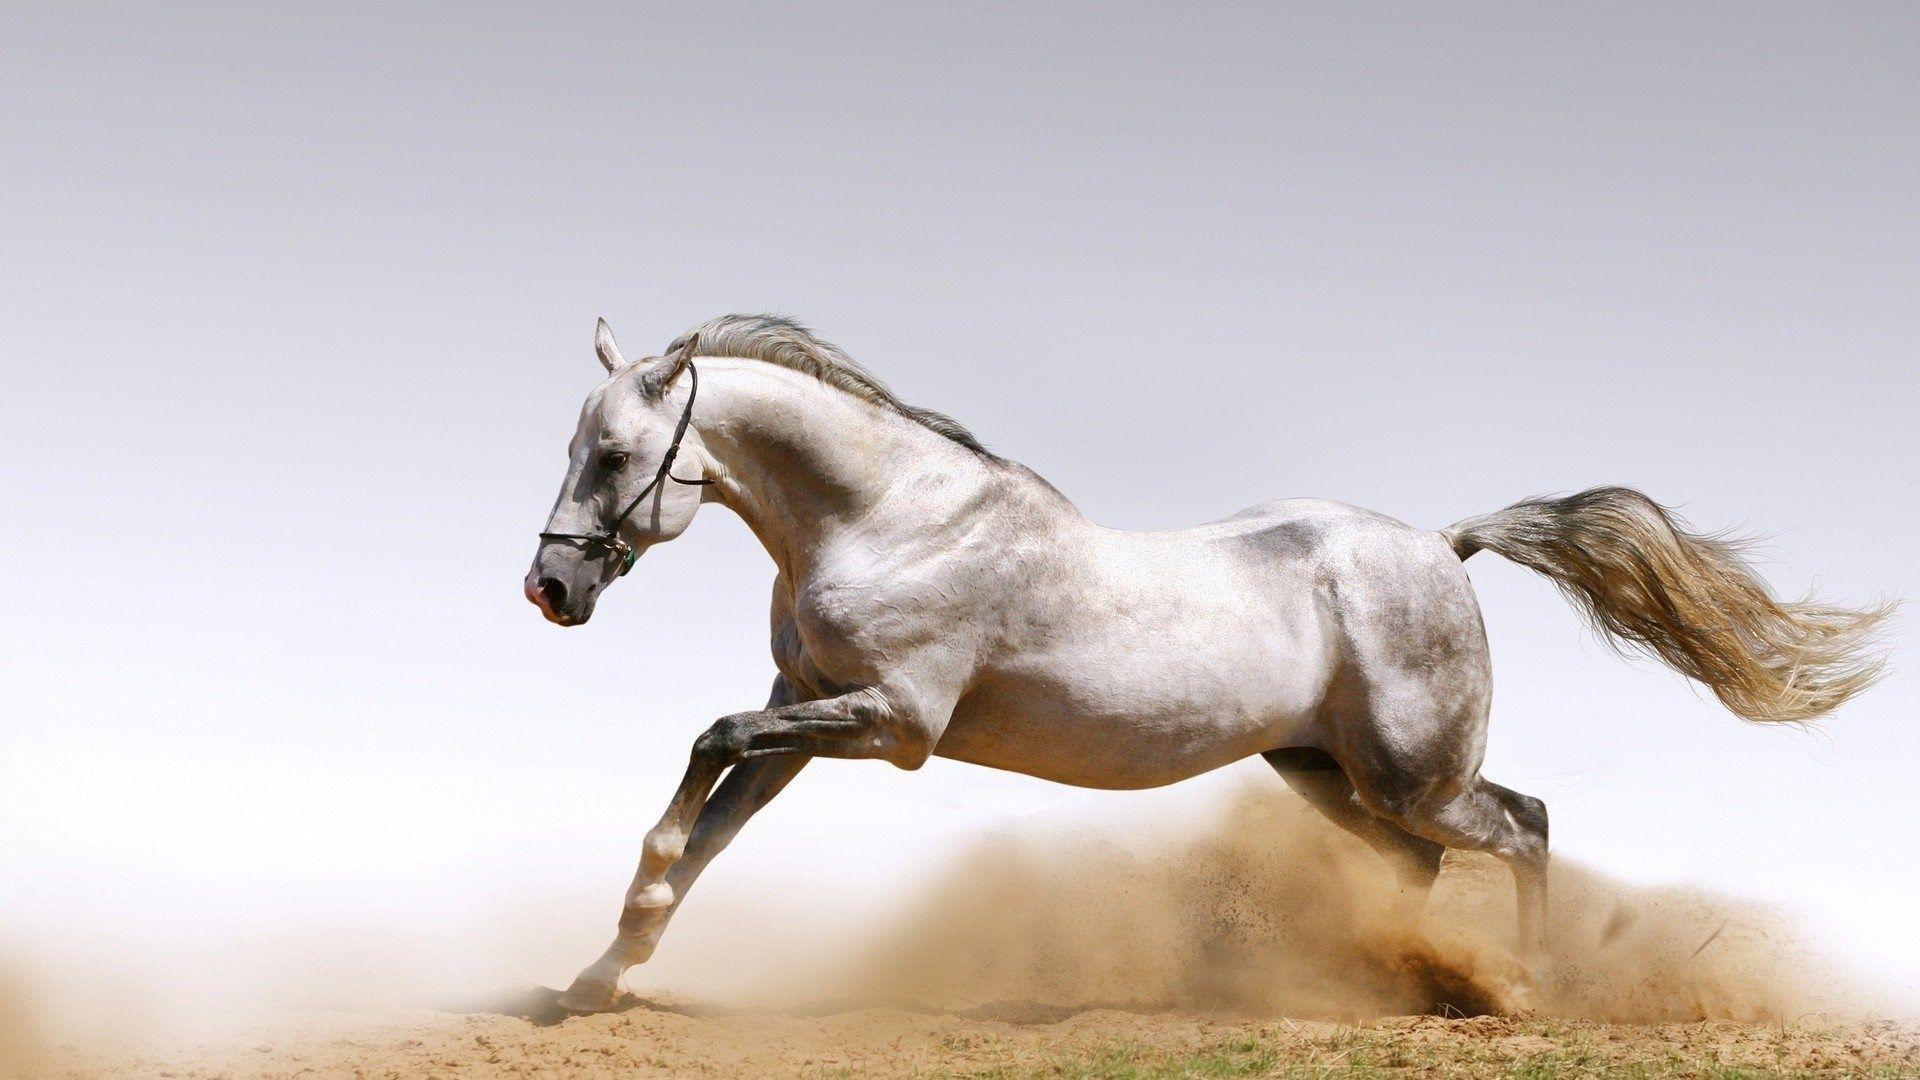 Popular Wallpaper Horse Family - 3a4a21c37679d0bb566bf9ef8c821ec7  Pictures_12956.jpg